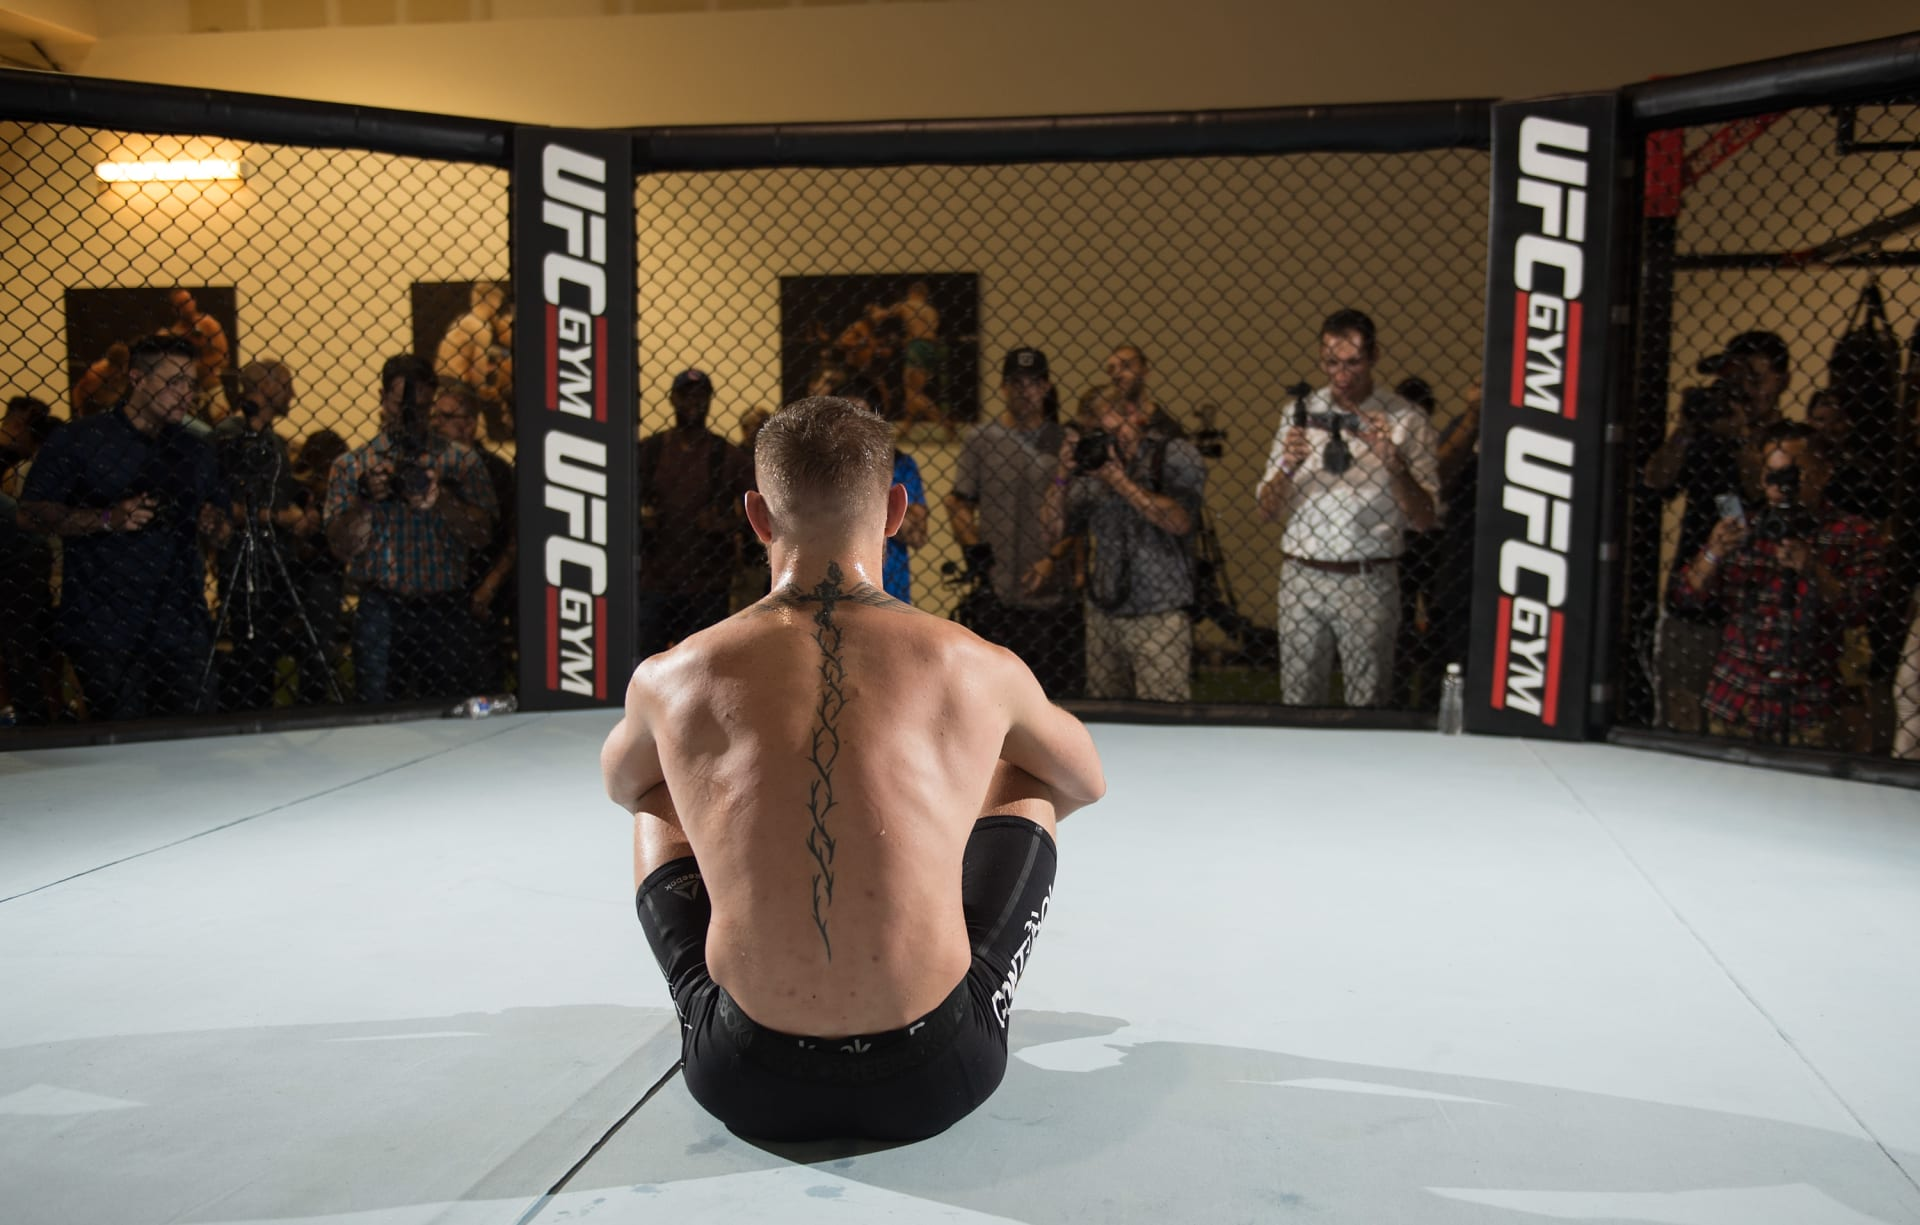 Conor McGregor UFC Gym 2017 Getty